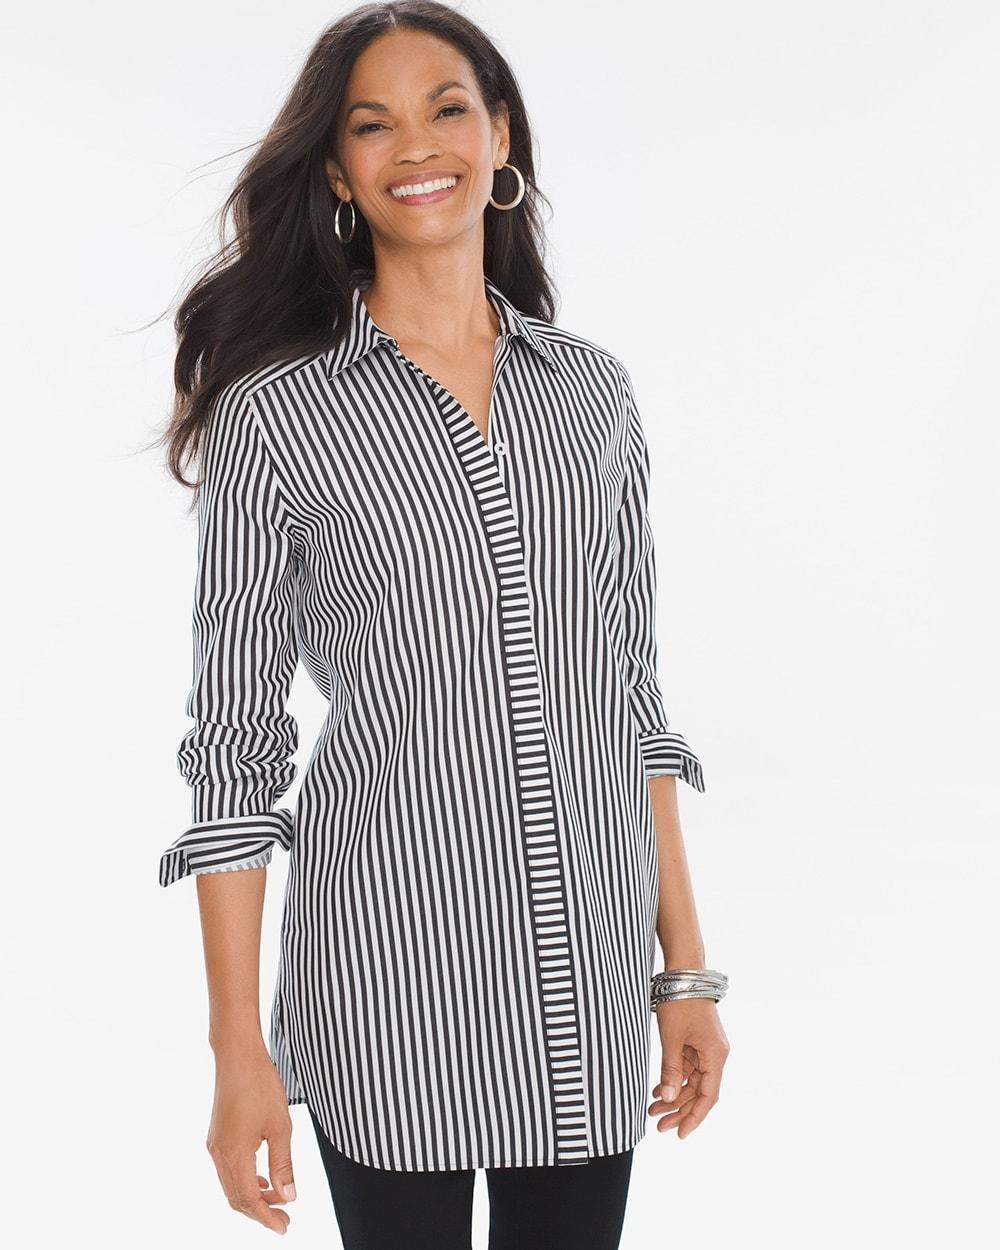 Sateen Striped Marie Shirt Chicos